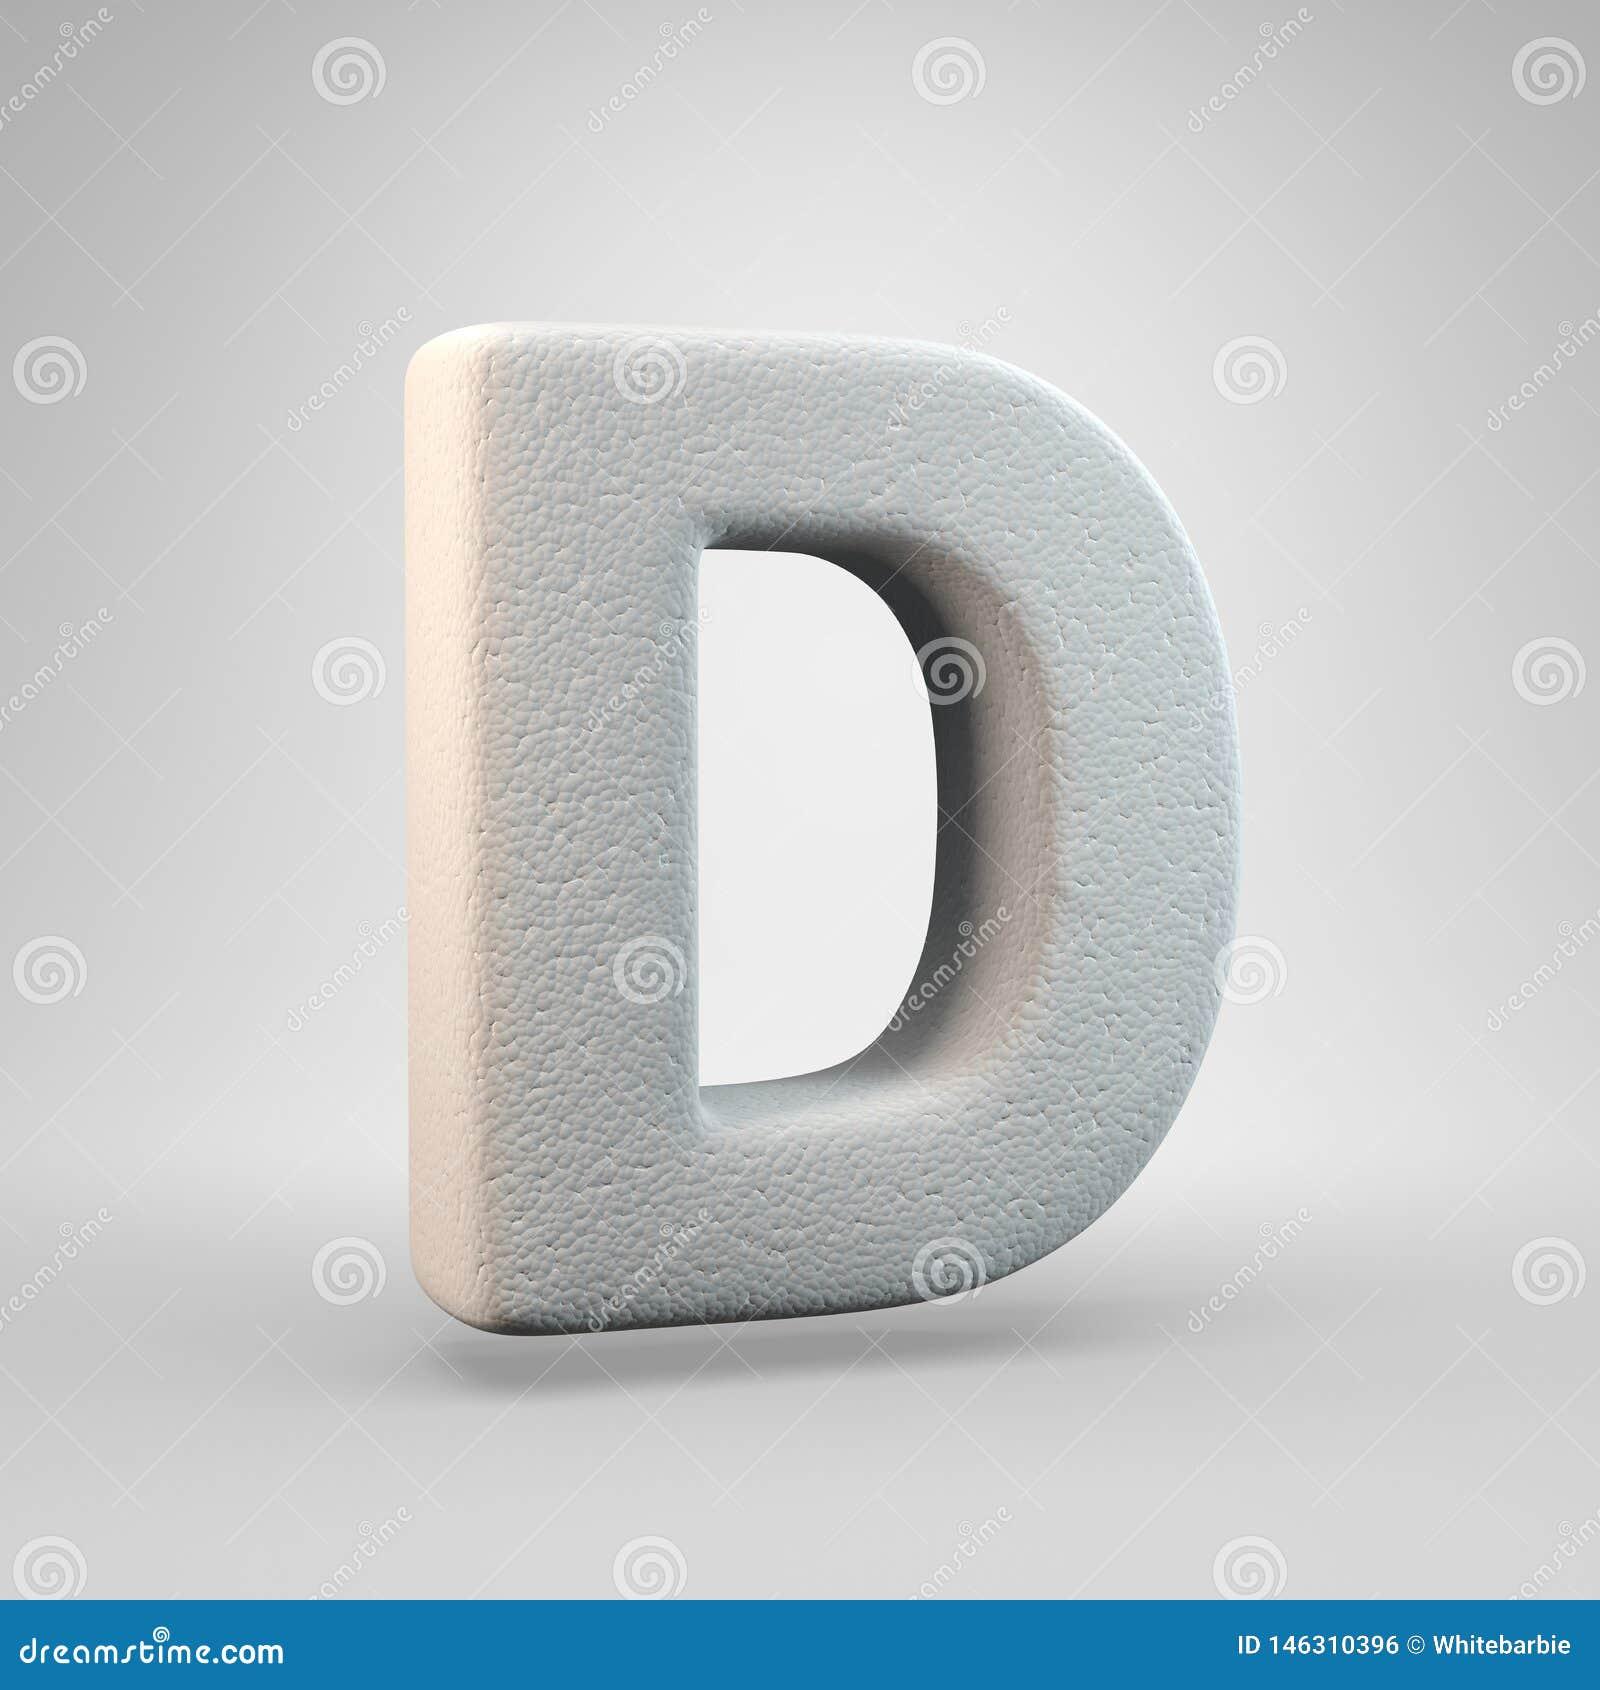 Volumetric construction foam uppercase letter D isolated on white background